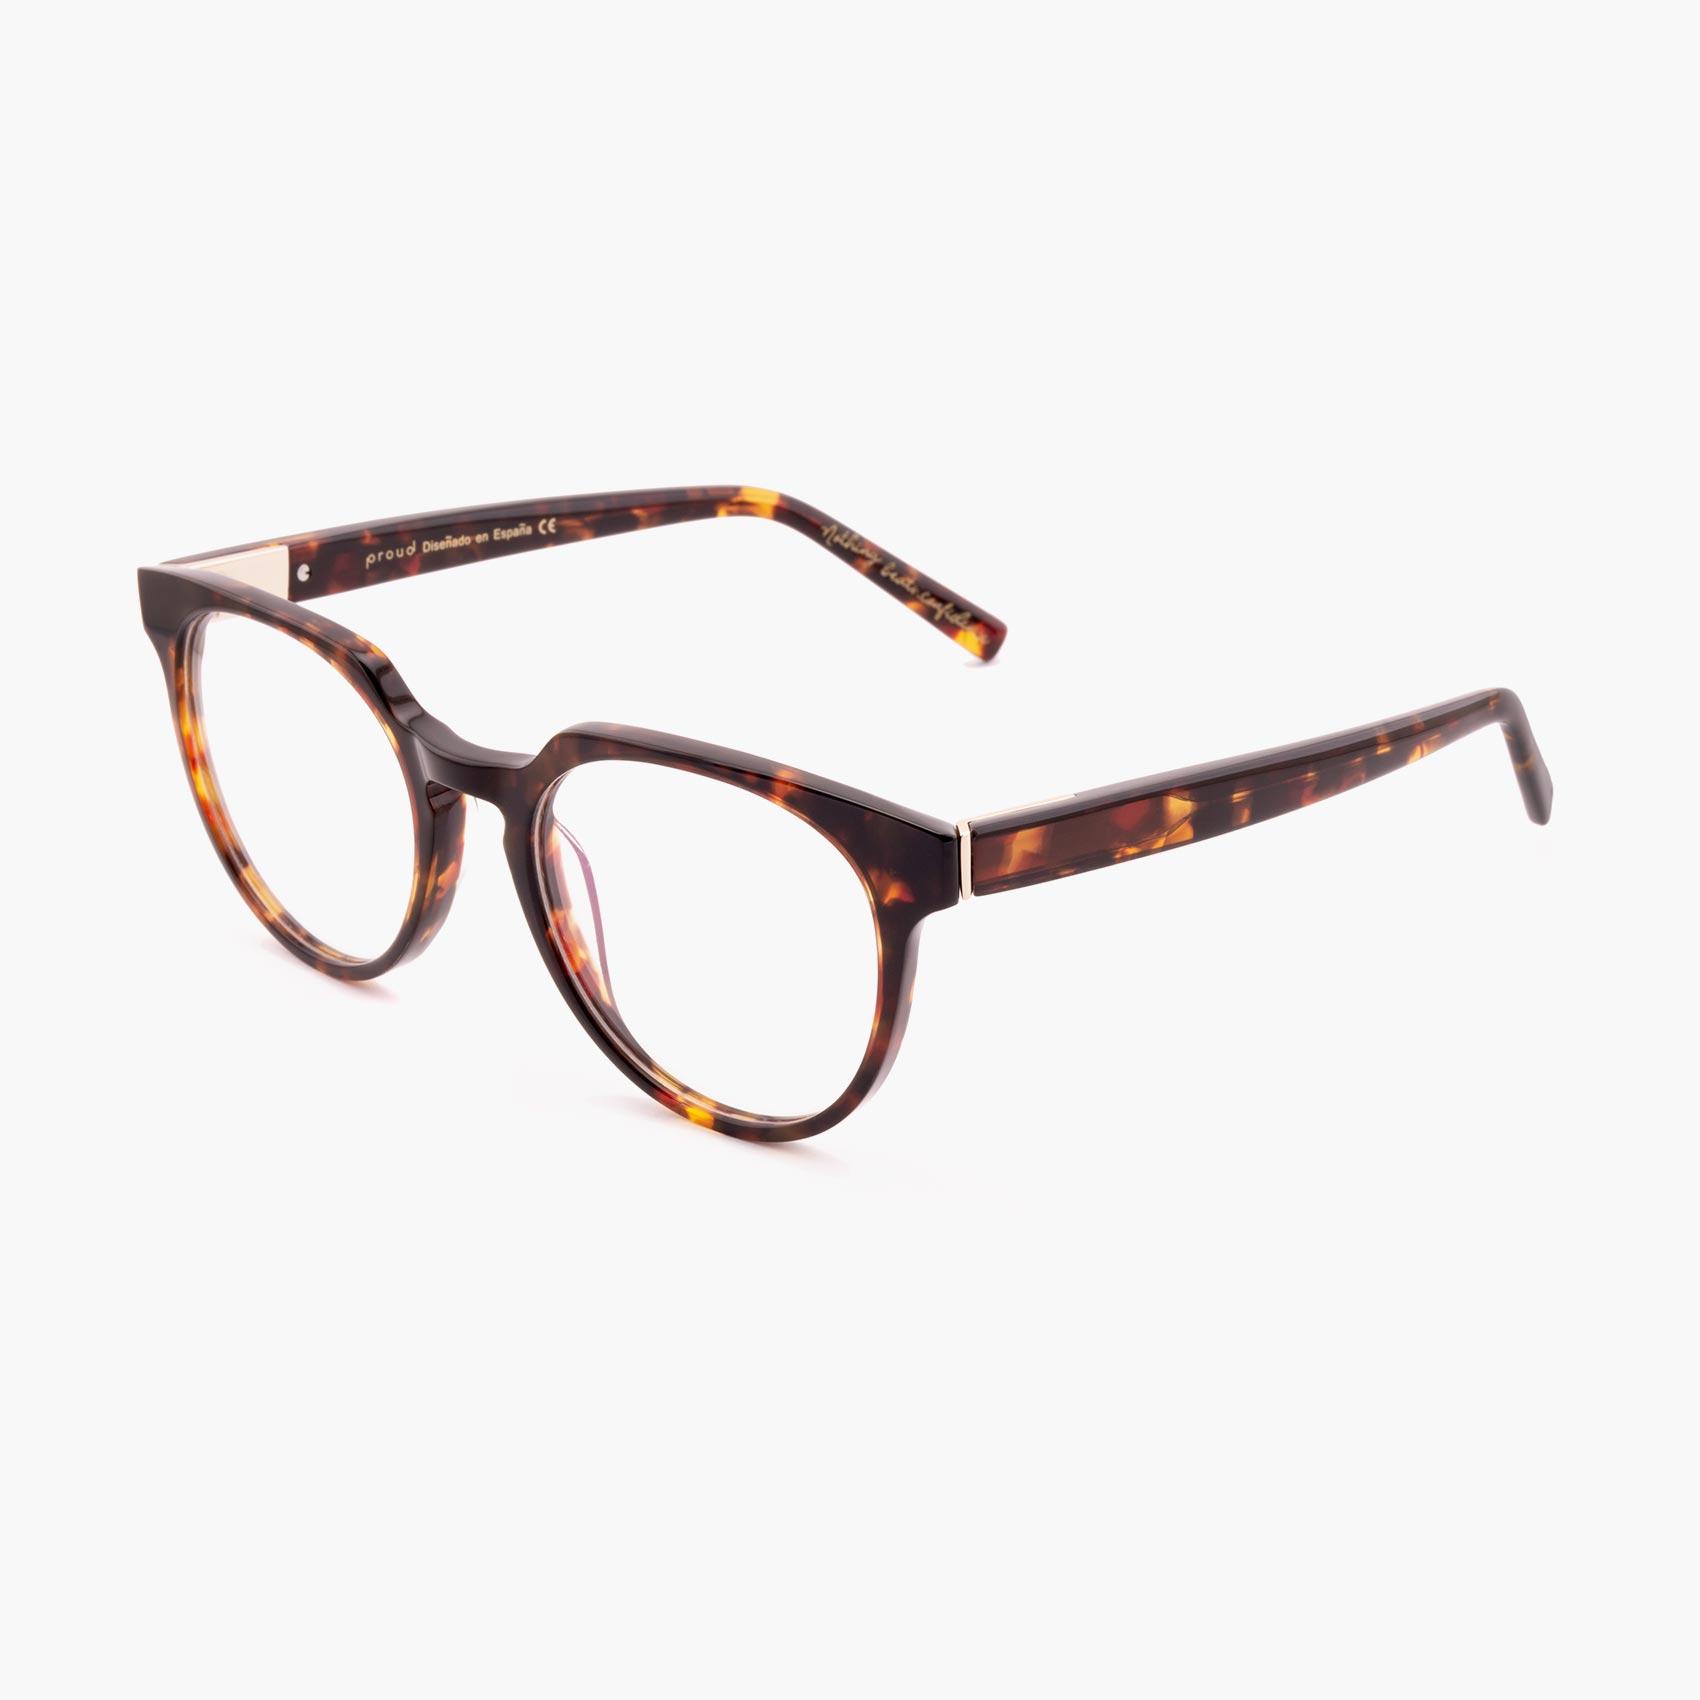 Proud eyewear Benigni C1 P tendencia gafas graduadas havana